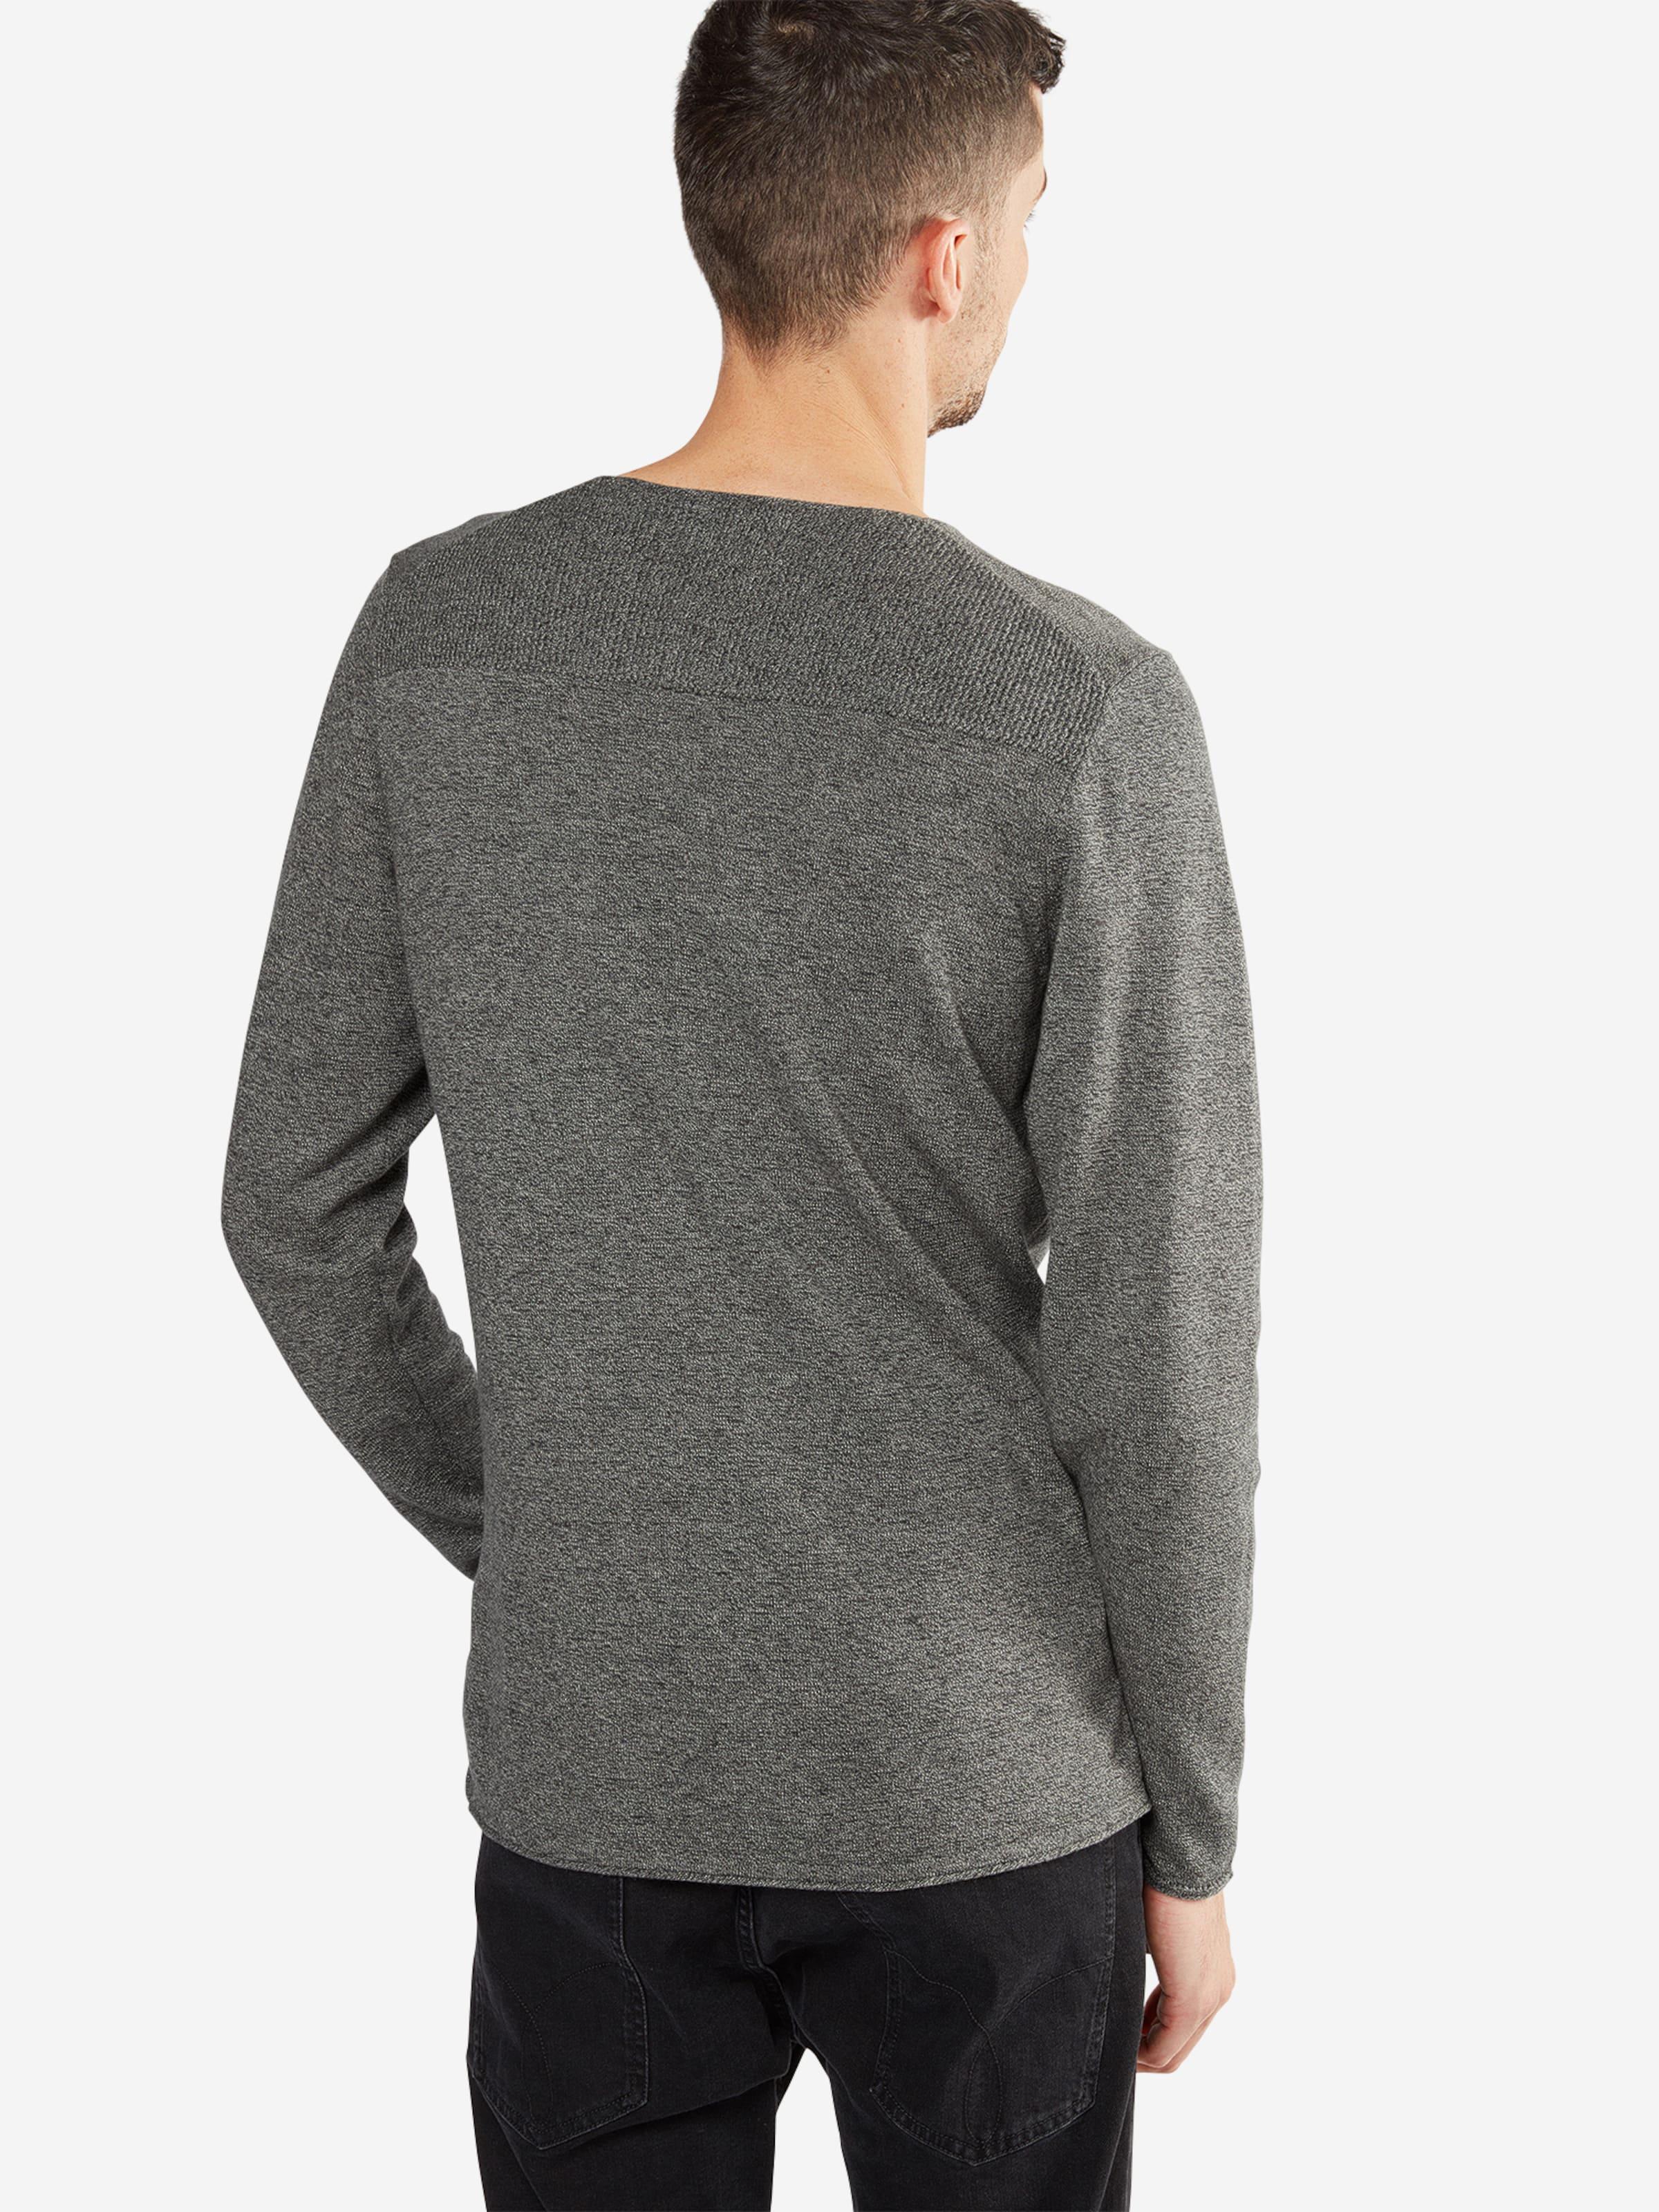 'fine NOWADAYS Pullover melange basic Pullover pullover' melange pullover' NOWADAYS basic 'fine ndgTfxETHW